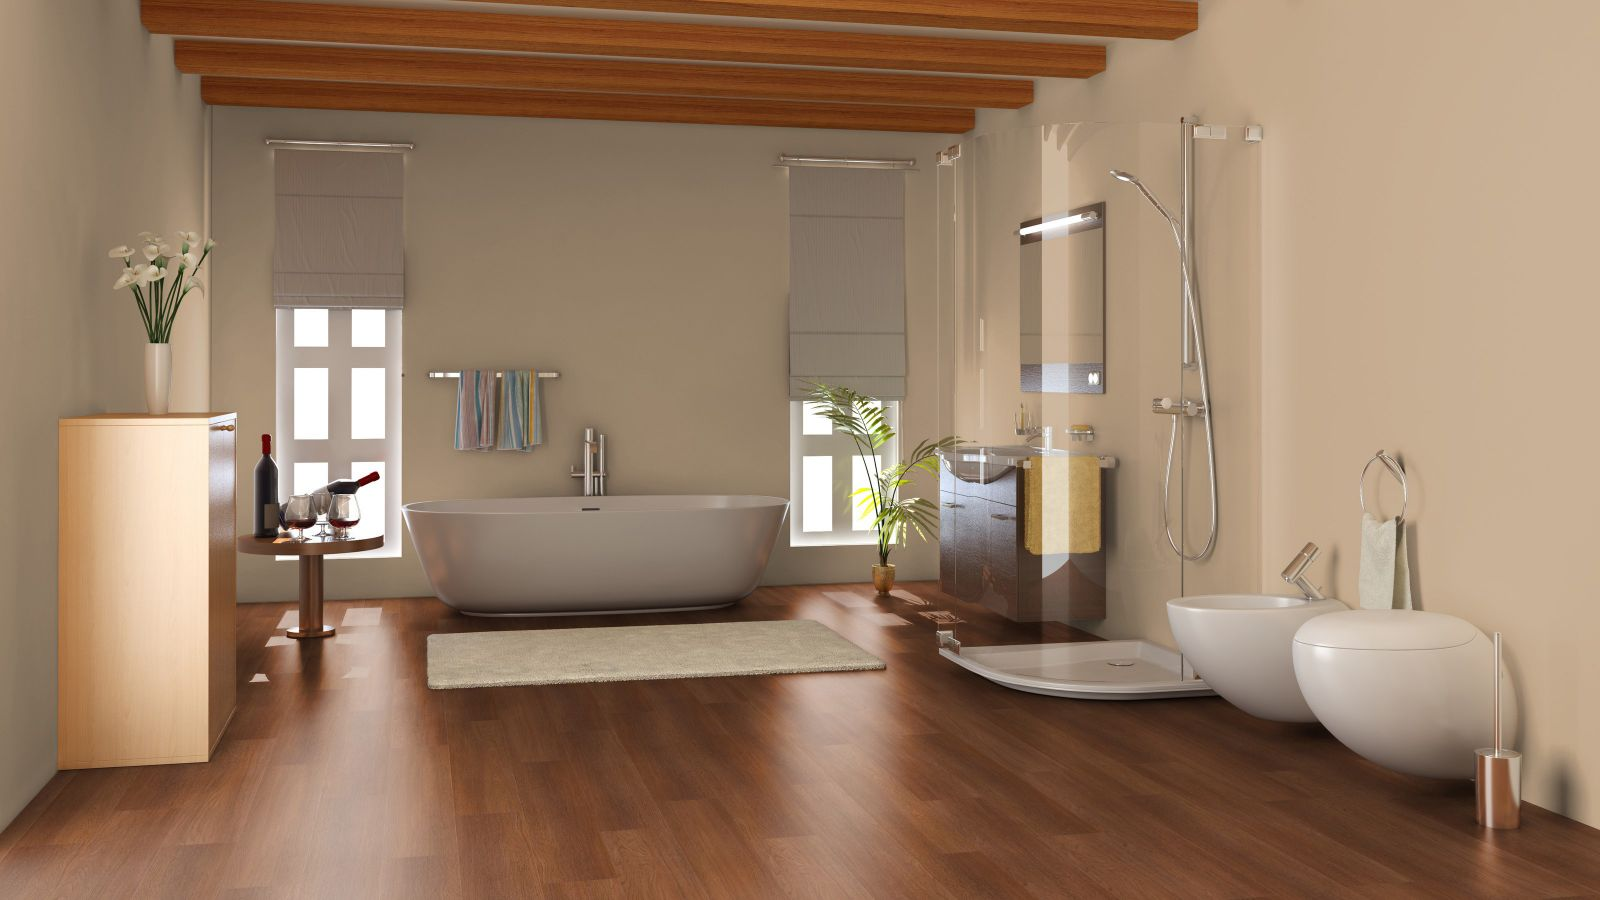 nl funvit badkamer bad plaatsen